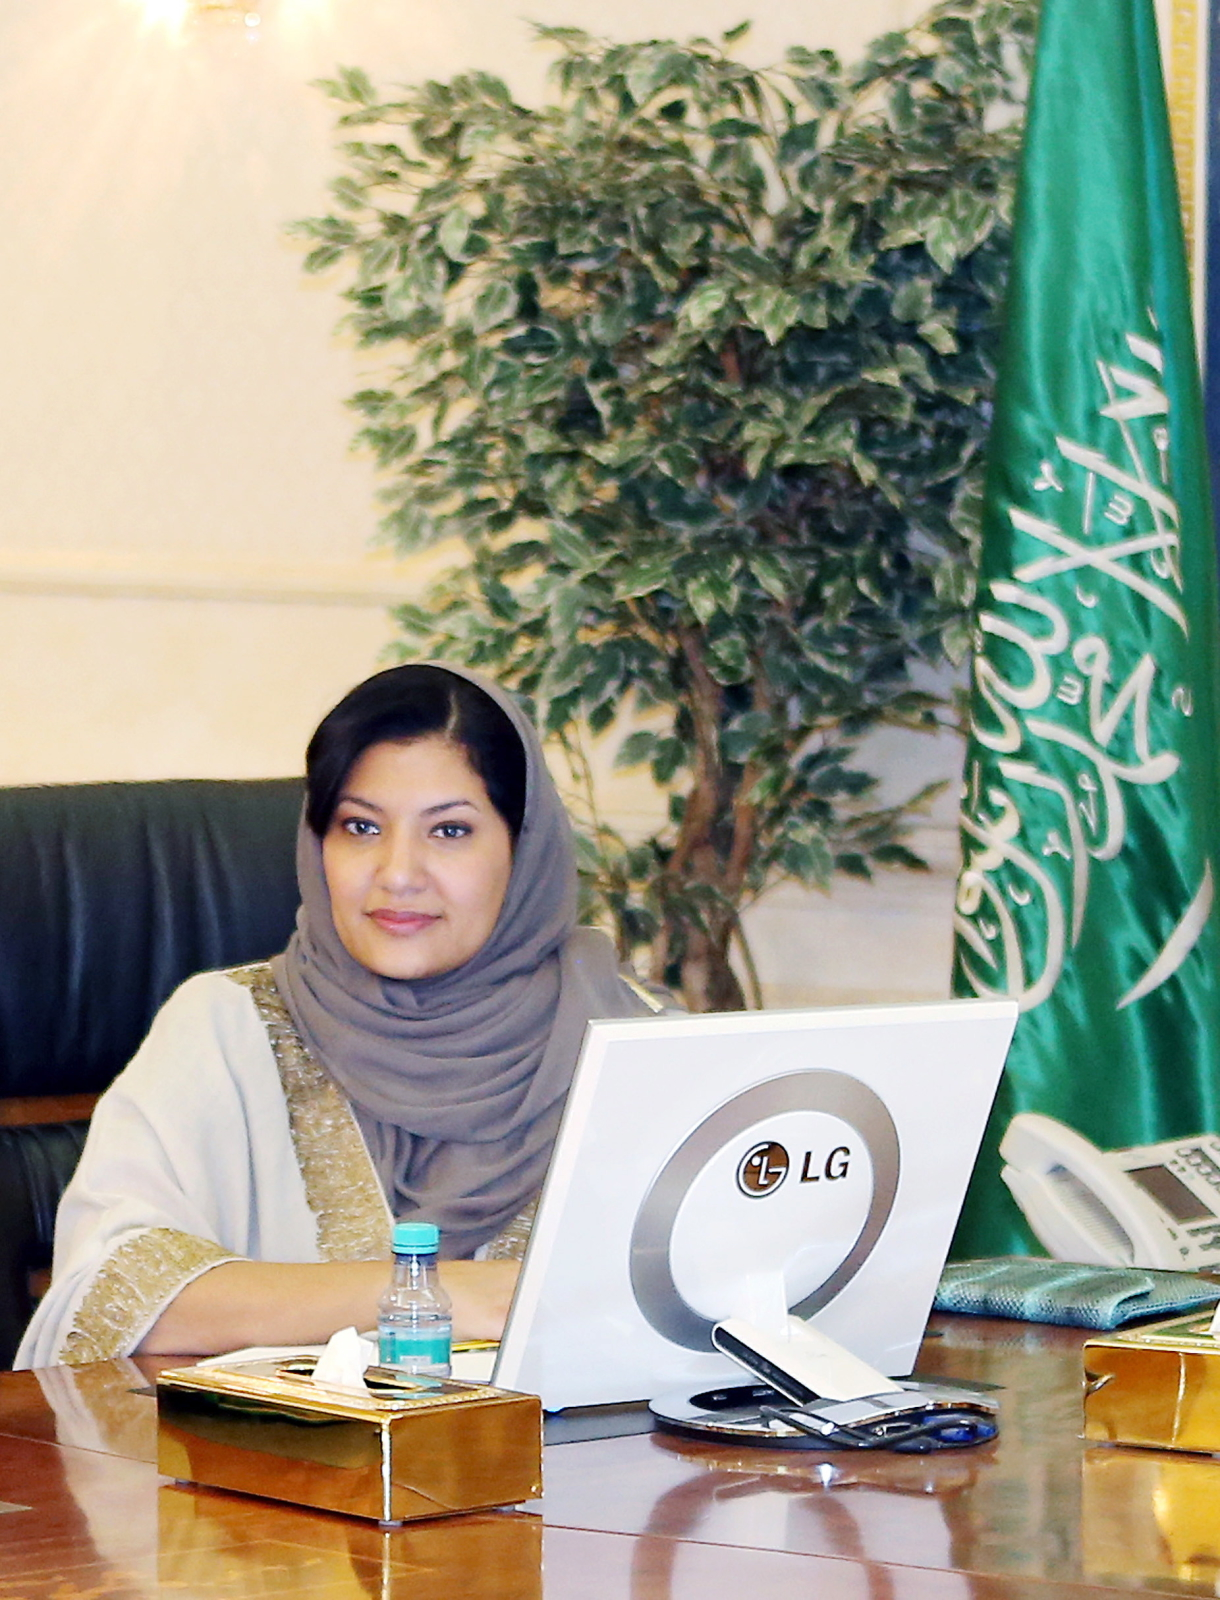 Reema bint Bandar al-Saud